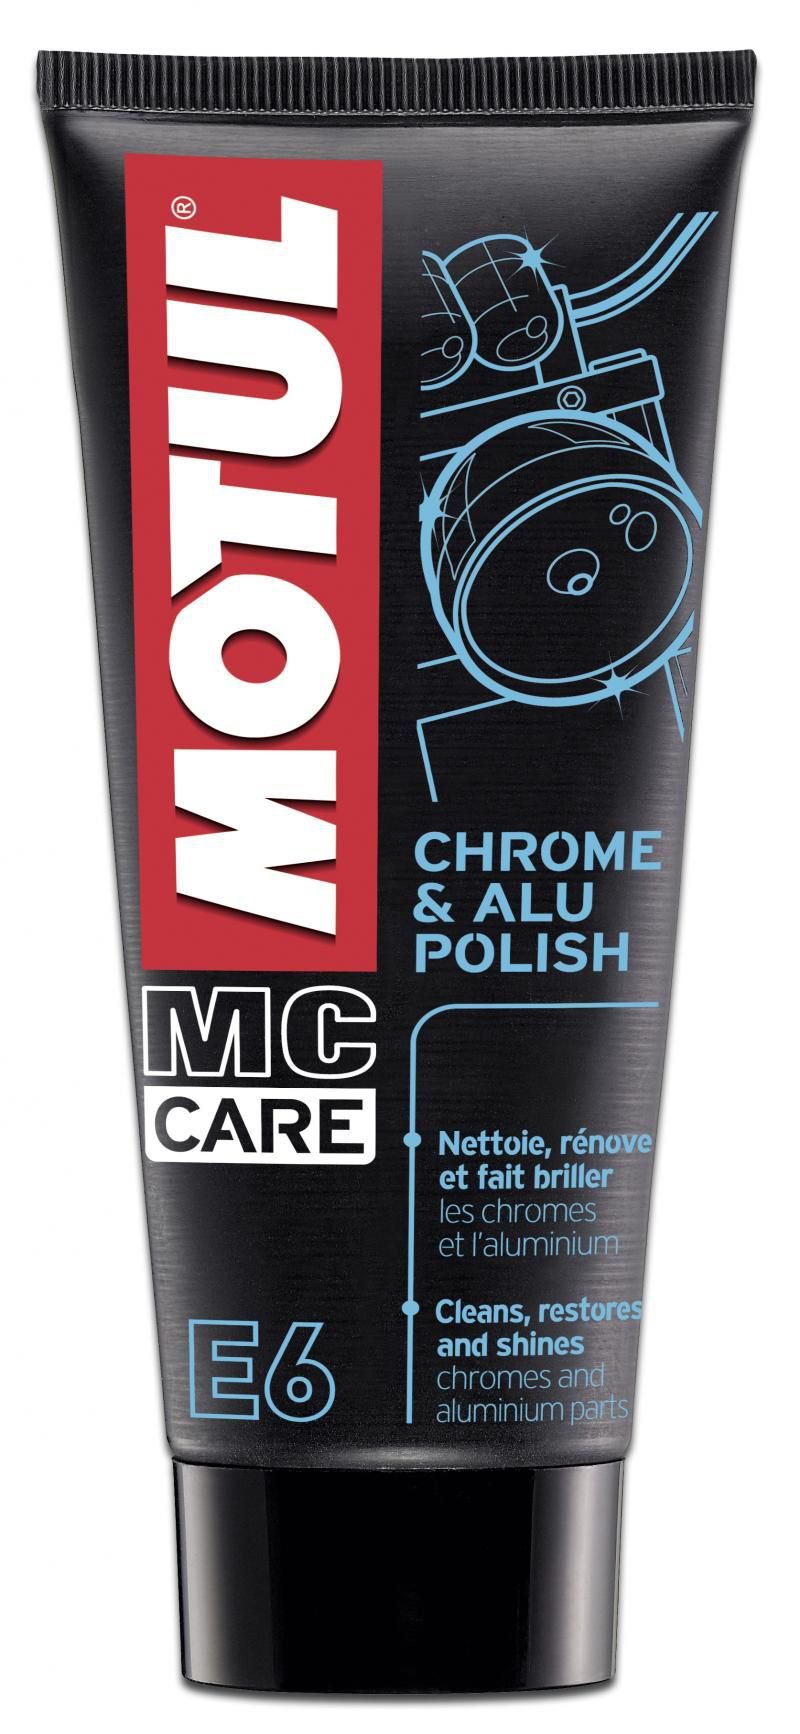 MOTUL MCCARE E6 CHROME ALU POLISH  - E-Shop Autostore - A loja do Canal Auto Didata